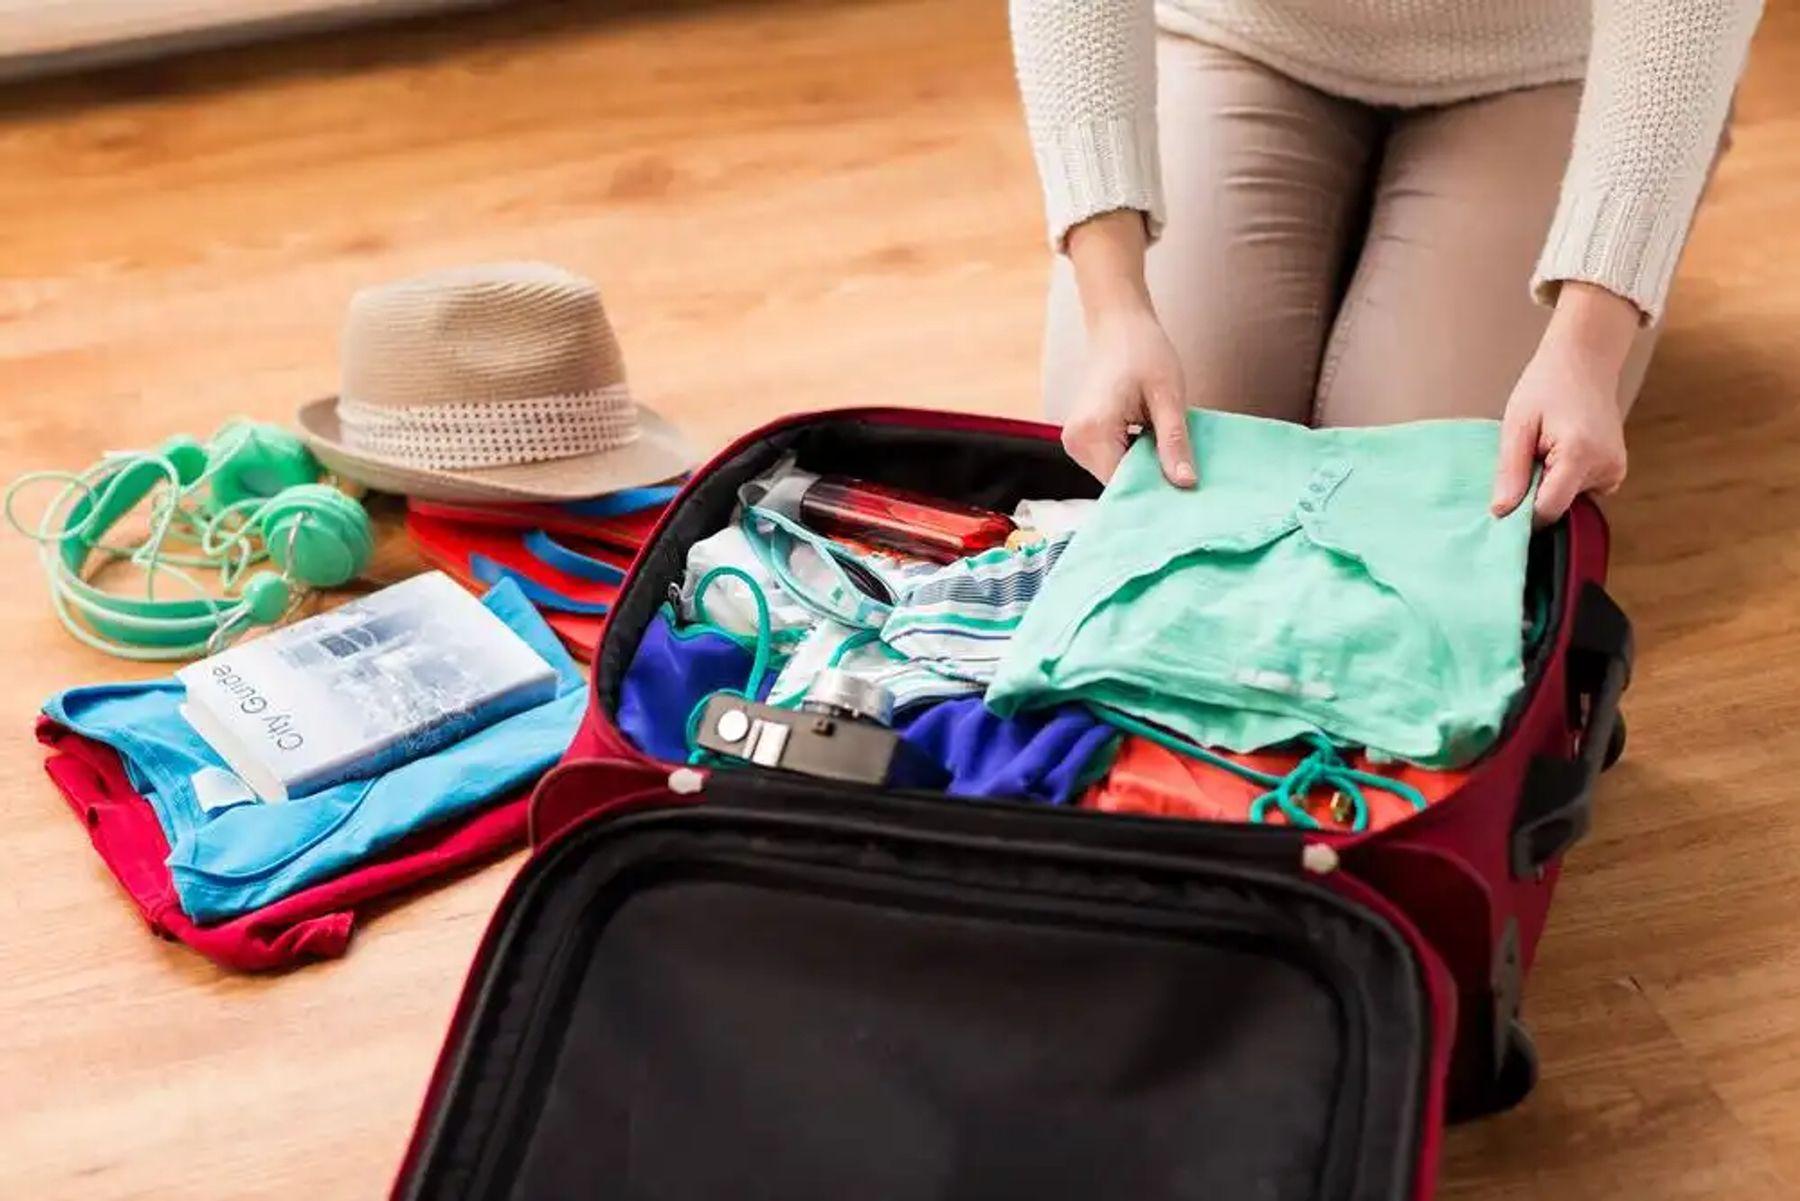 sắp xếp đồ đạc vào vali